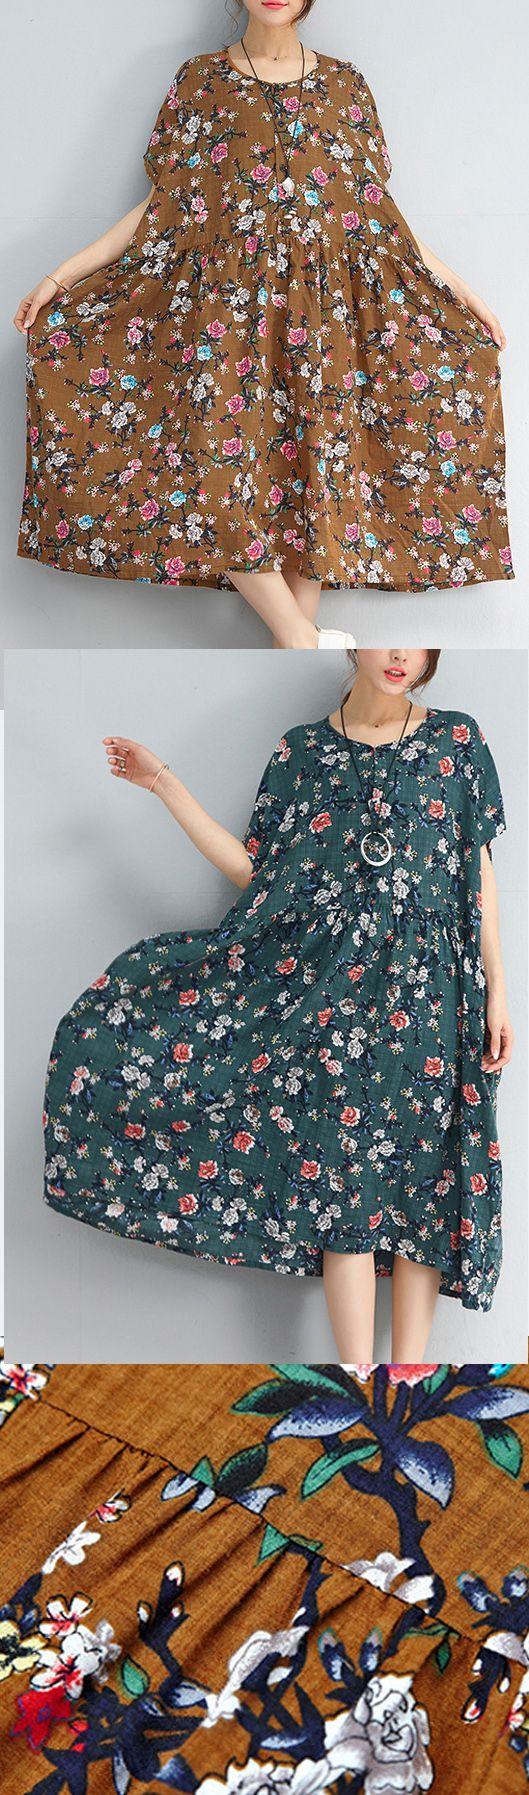 defa81e717f5 stylish yellow floral linen dresses plus size clothing shirt dress2018short  sleeve cotton dress plussizedress omychic